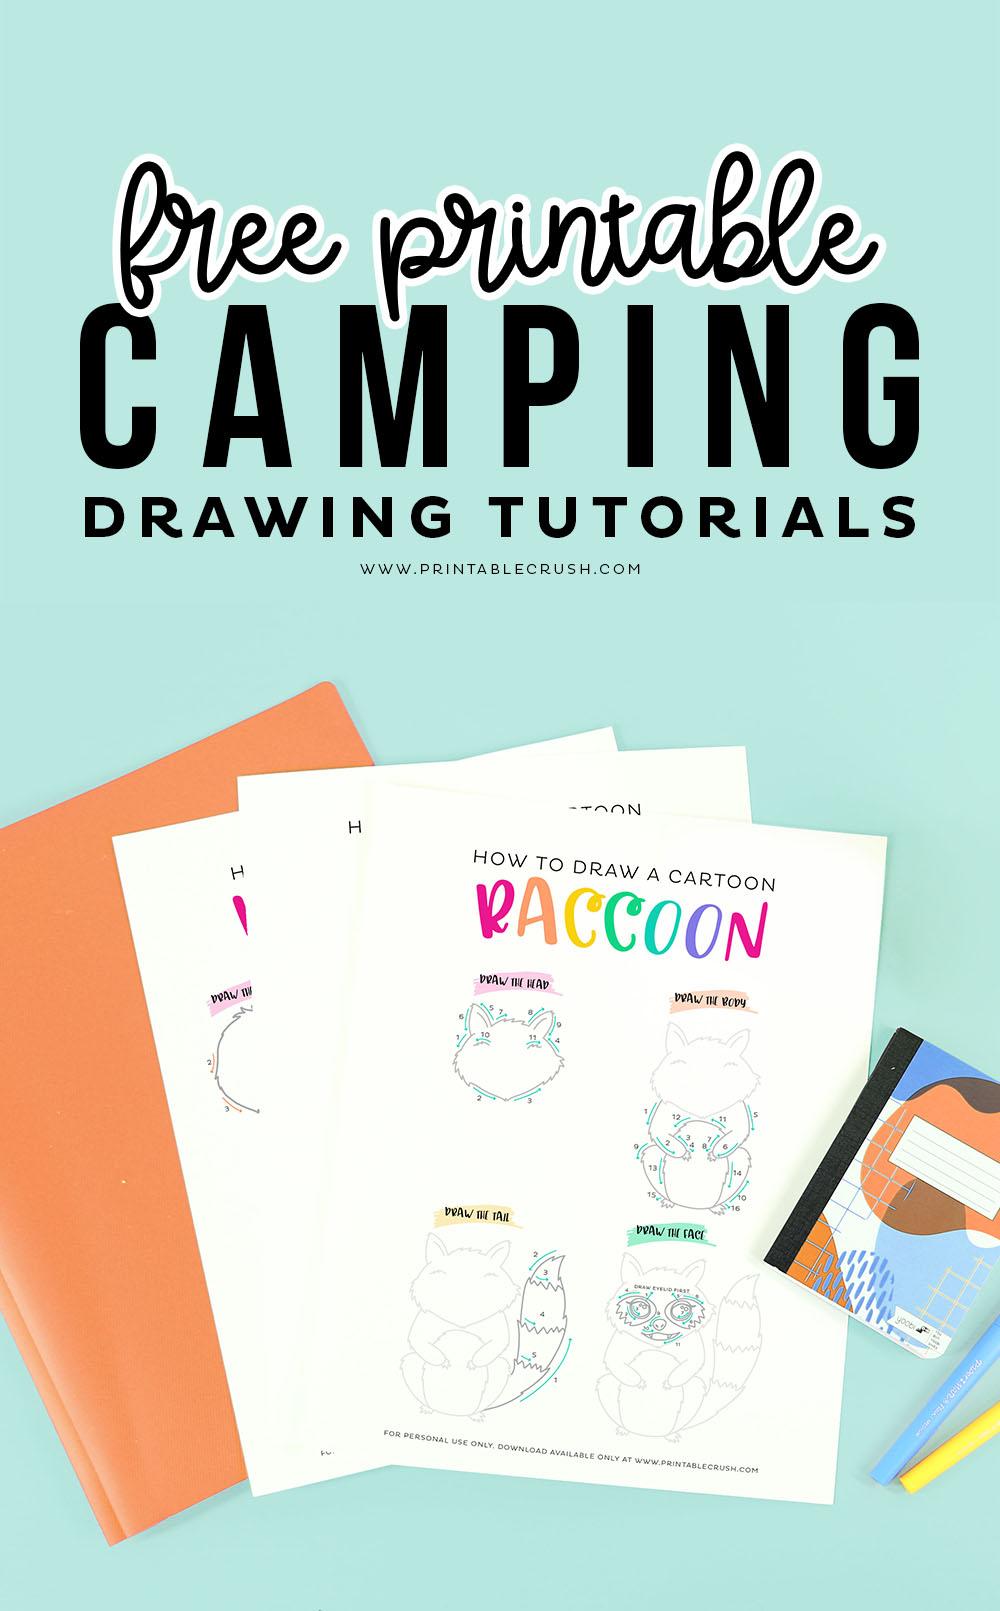 Free Camping Drawing Tutorial Printables via @printablecrush